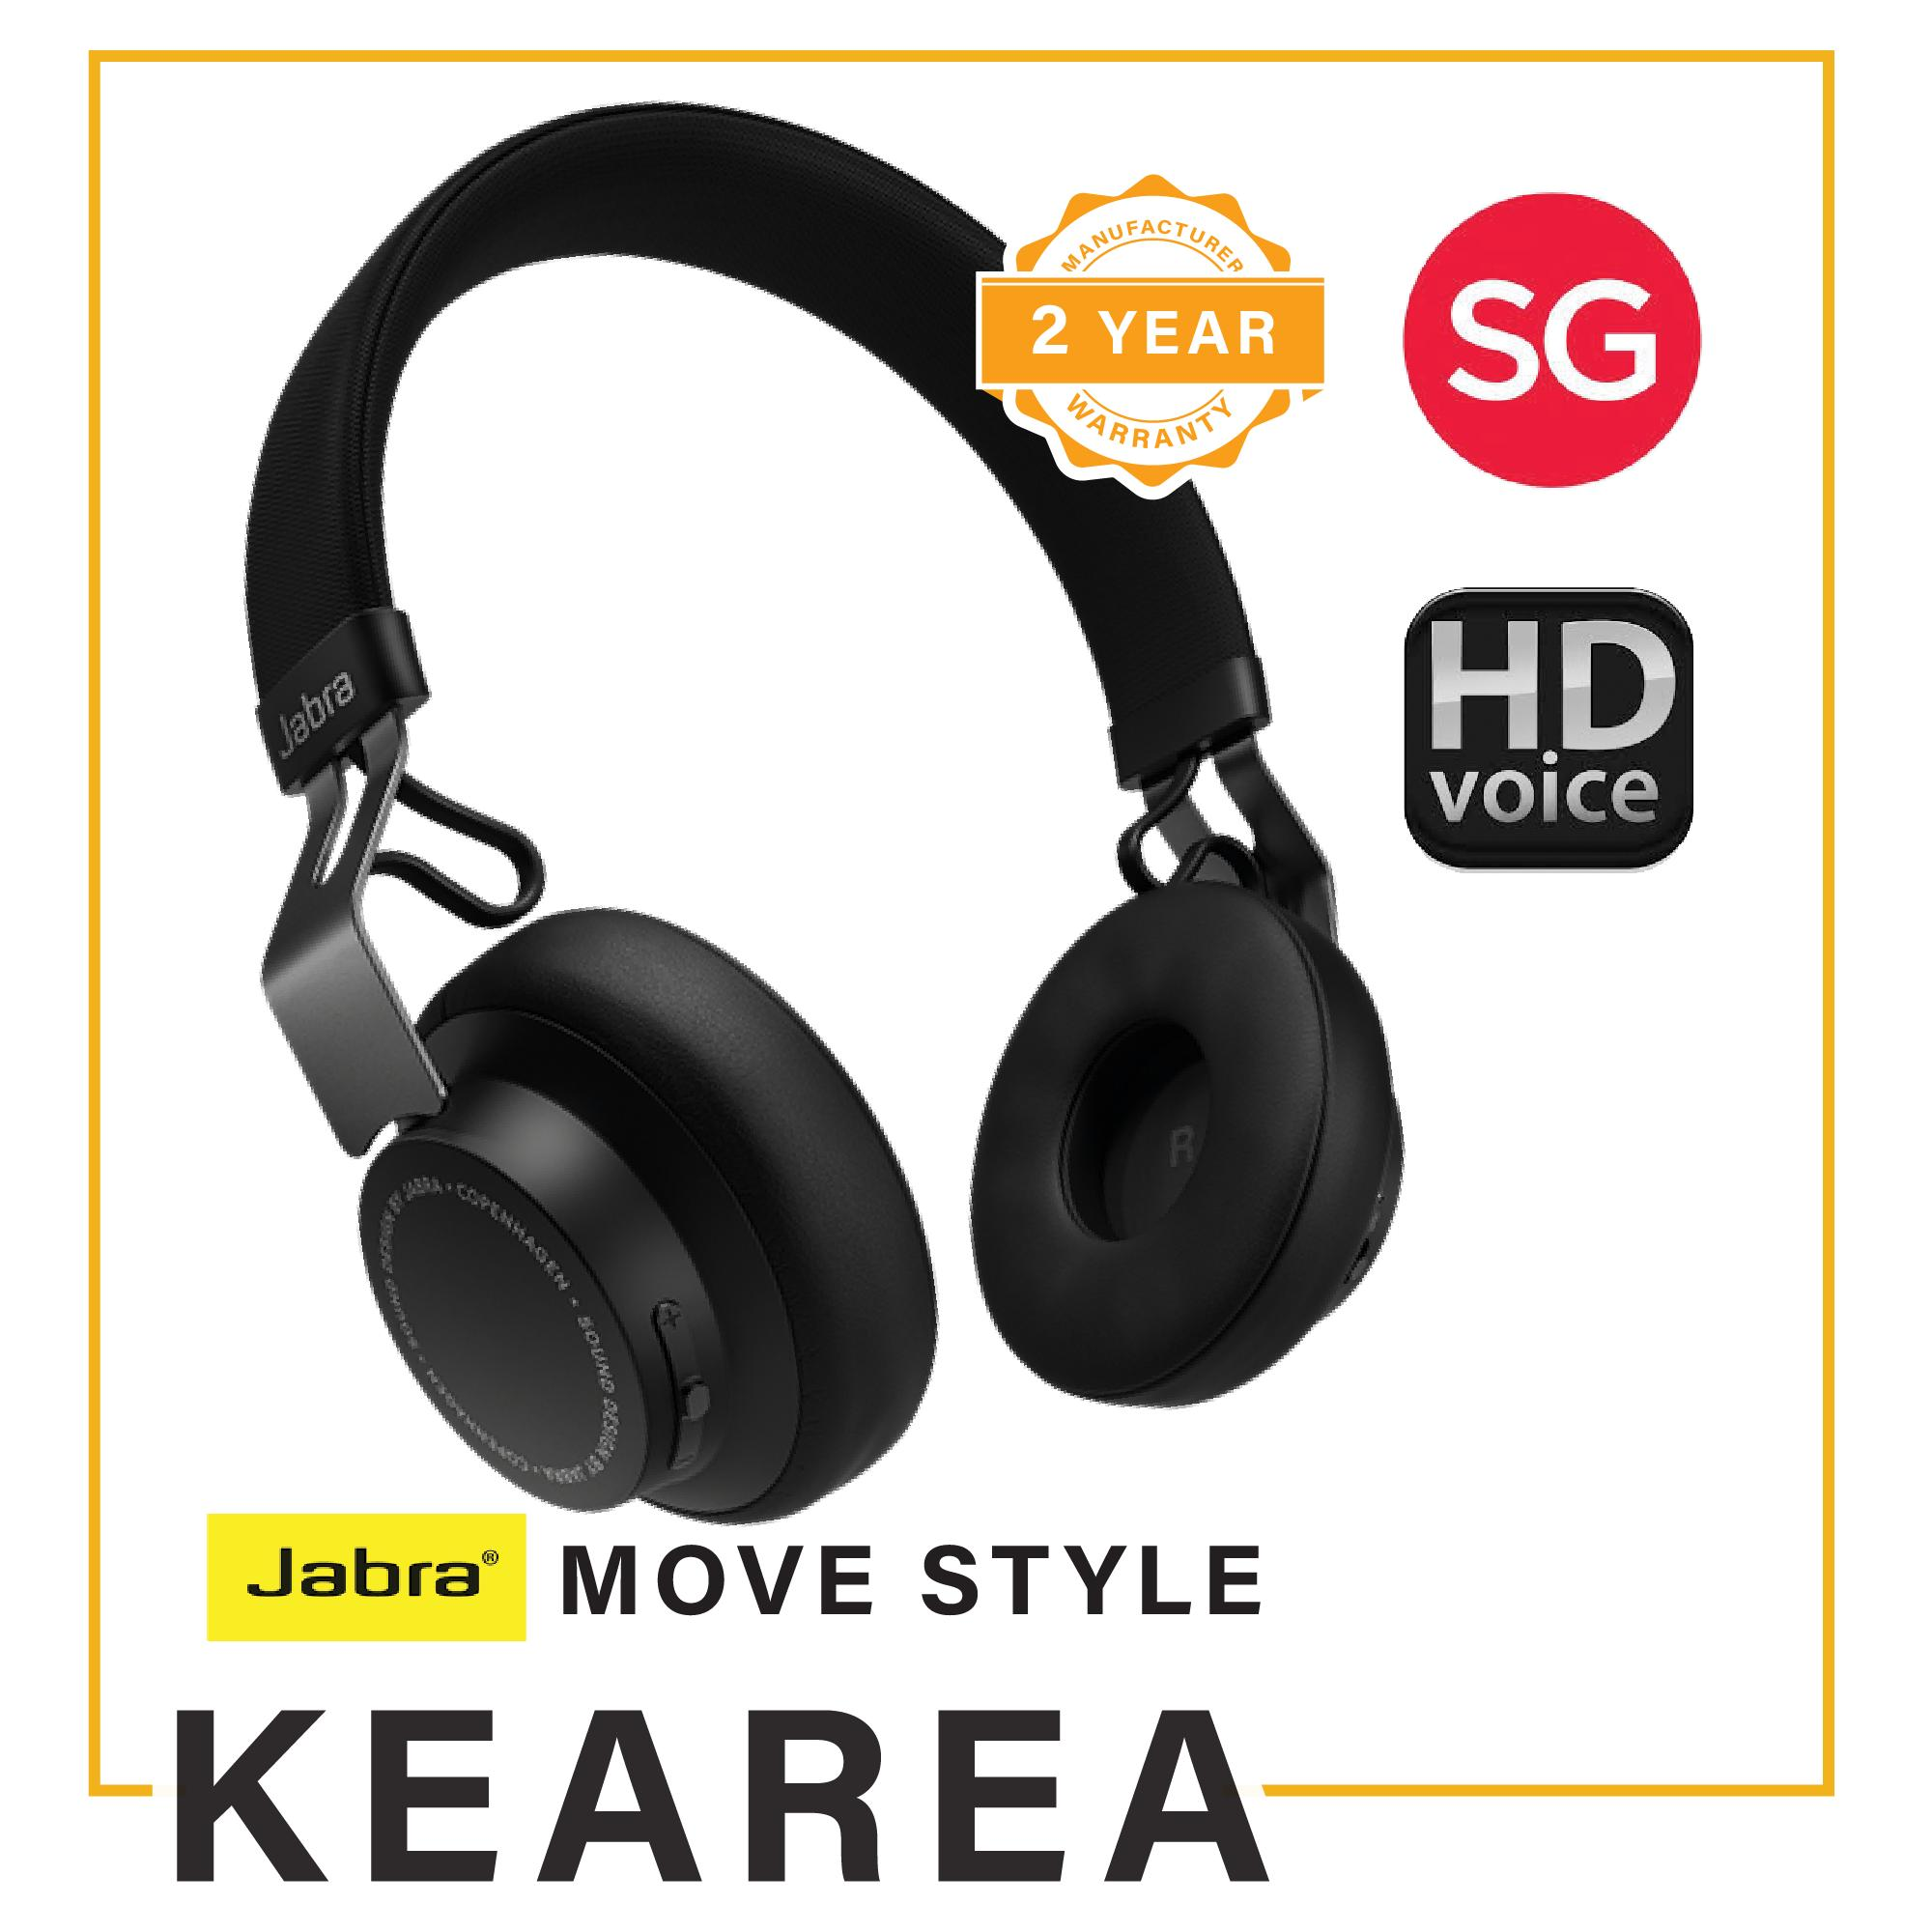 9befbeae75b Jabra Move Style (Mar'19) Bluetooth Wired/Wireless Headphones (Local  Manufacturer